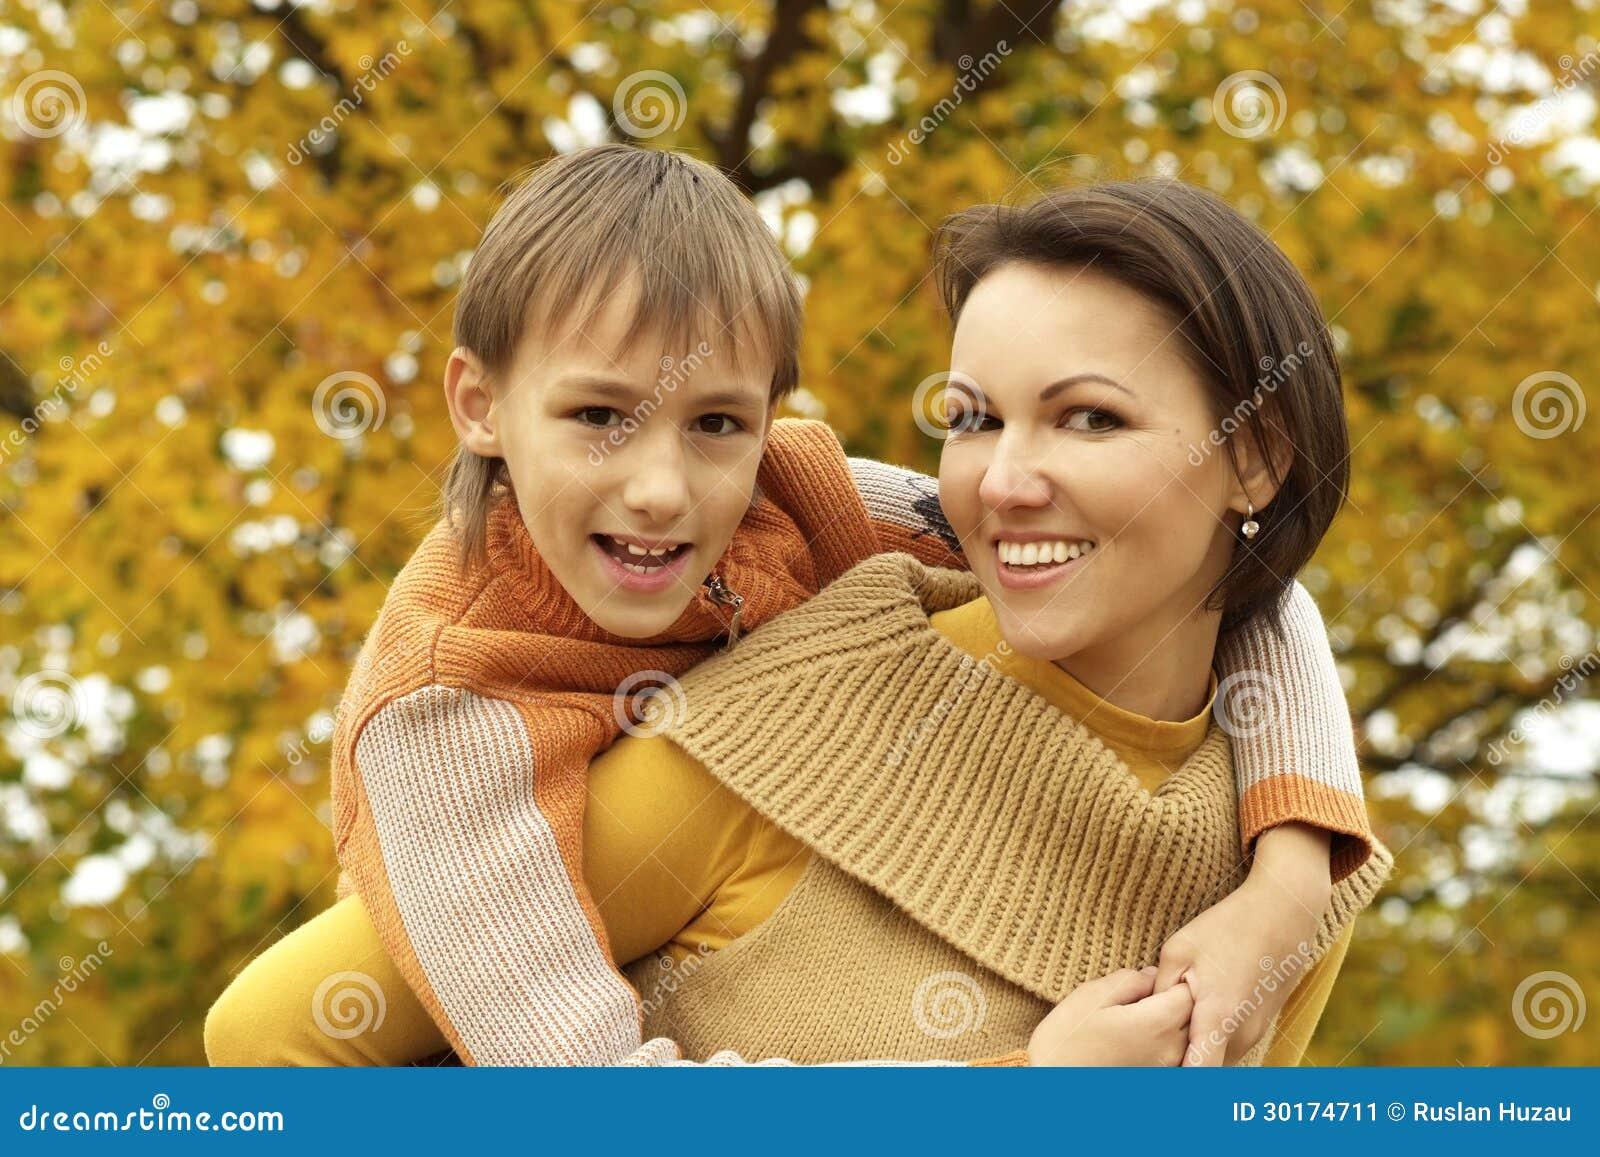 Nice mom images 45